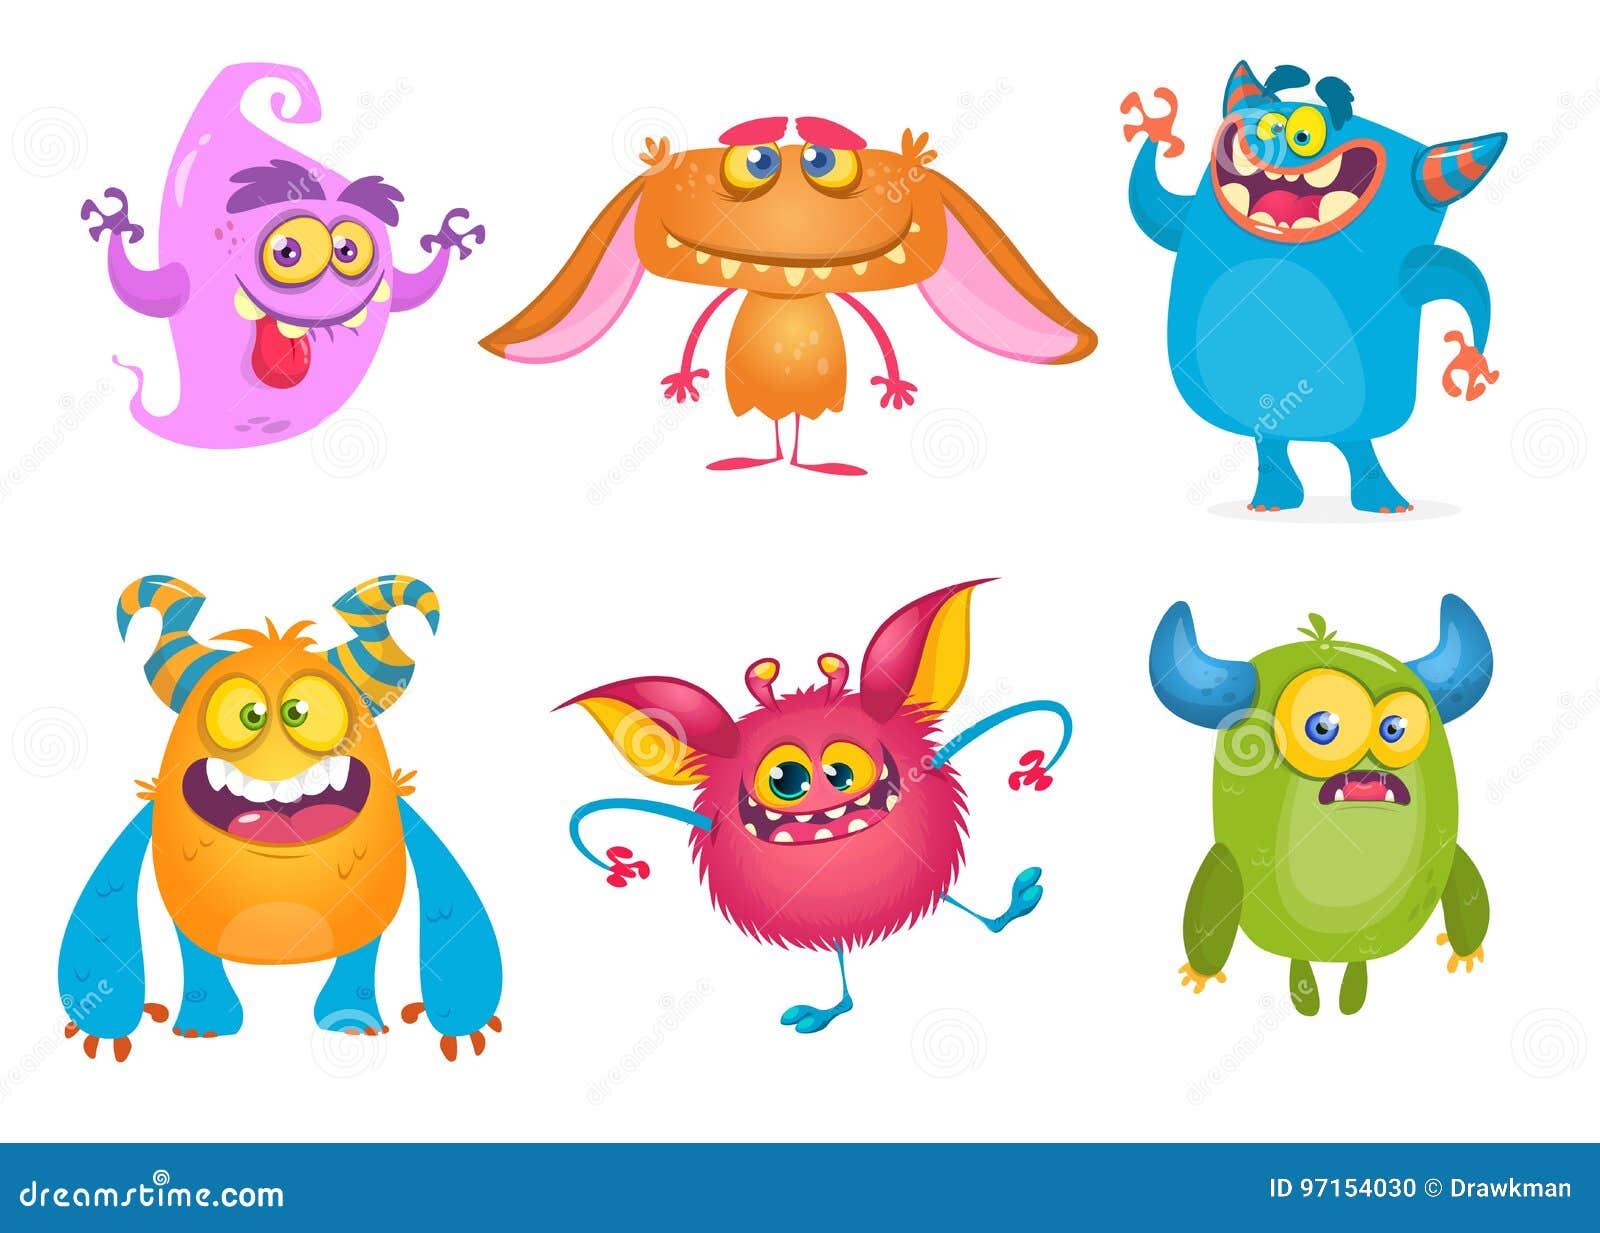 Cute cartoon Monsters. Vector set of cartoon monsters: ghost, goblin, bigfoot yeti, troll and alien. Halloween characters isolated